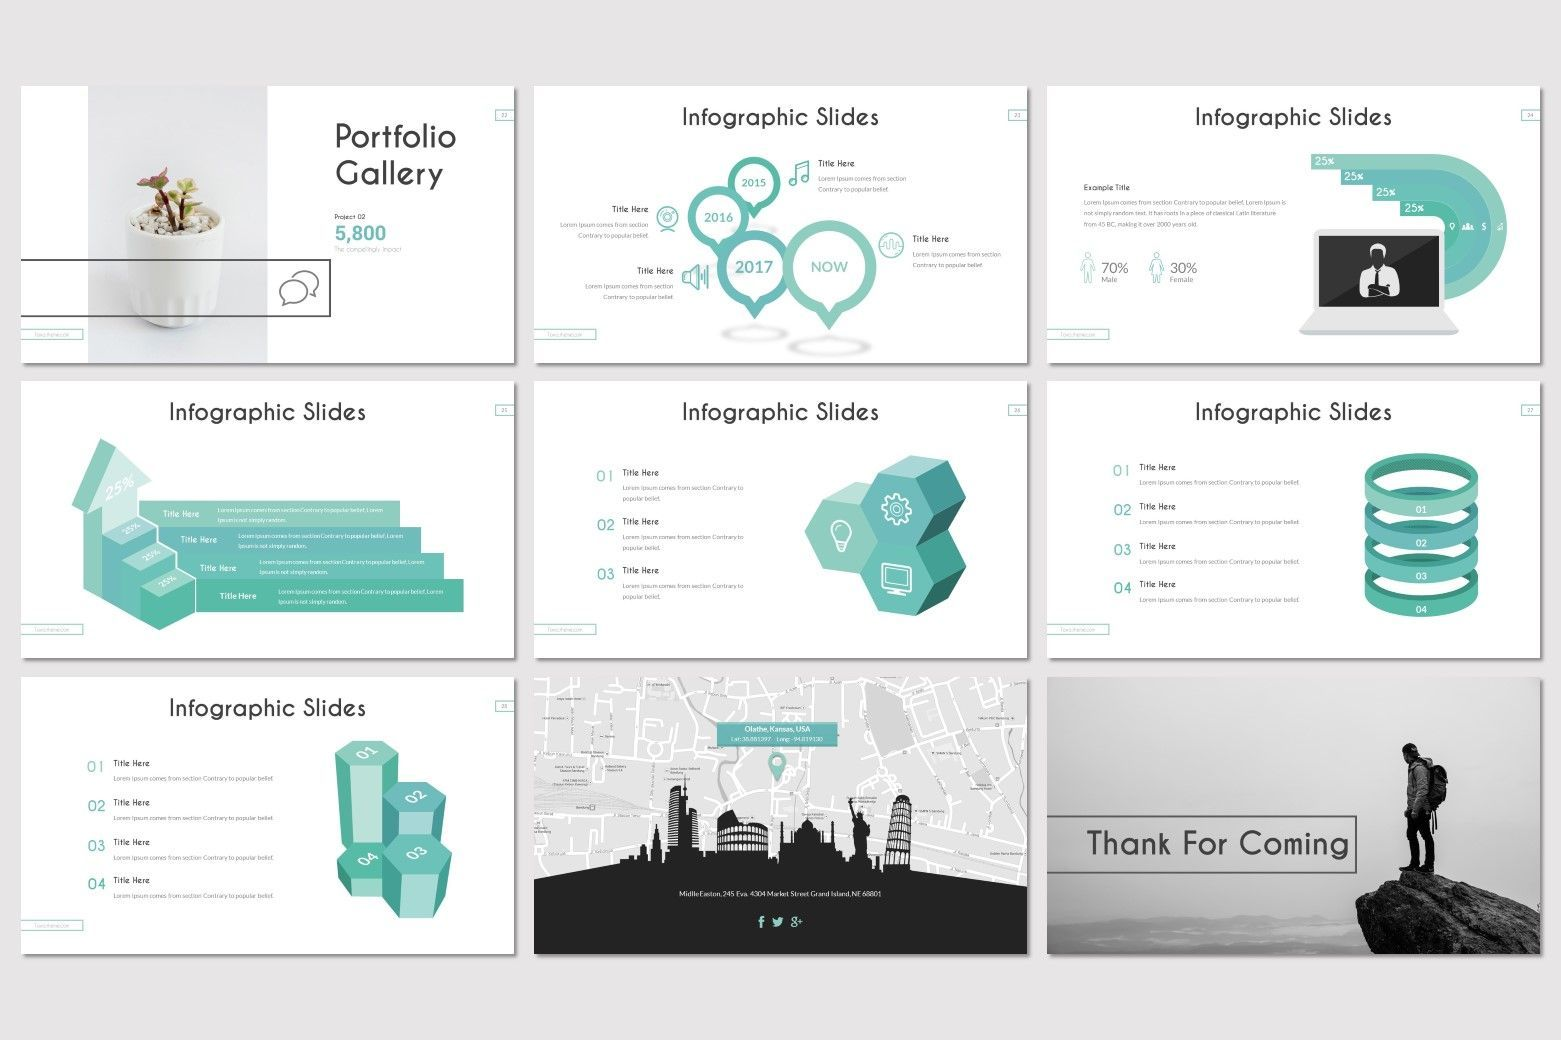 Toxa - PowerPoint Template, Slide 5, 08616, Presentation Templates — PoweredTemplate.com